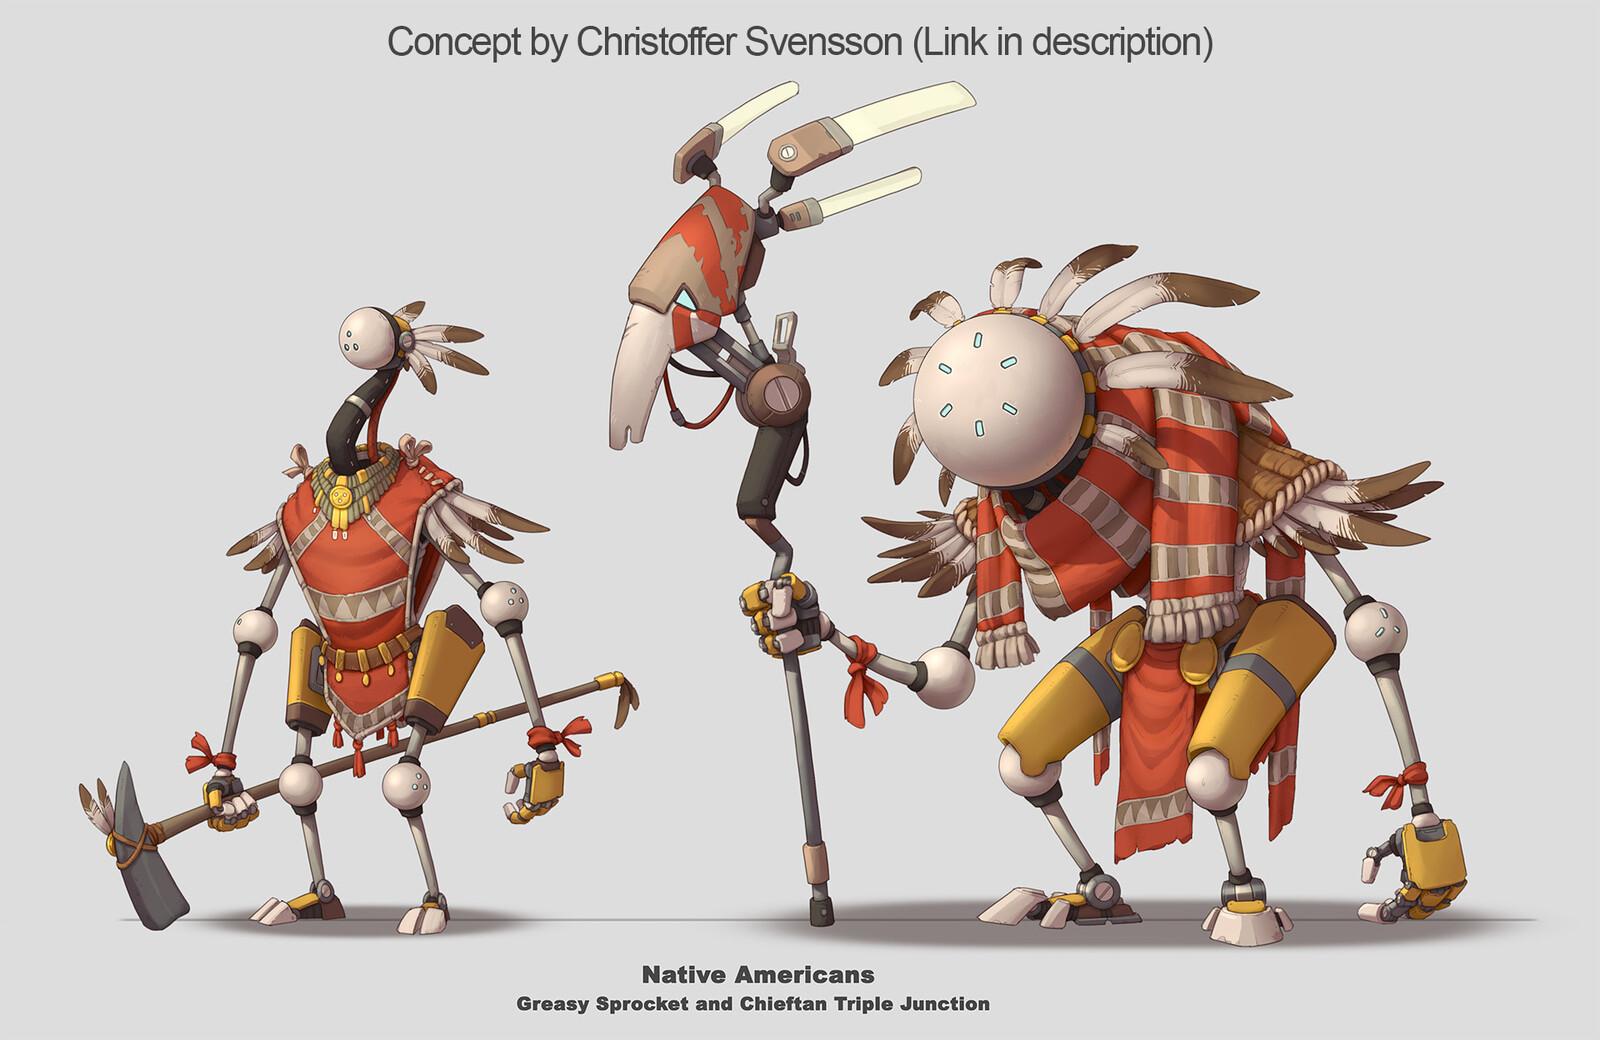 Concept by Christoffer Svensson